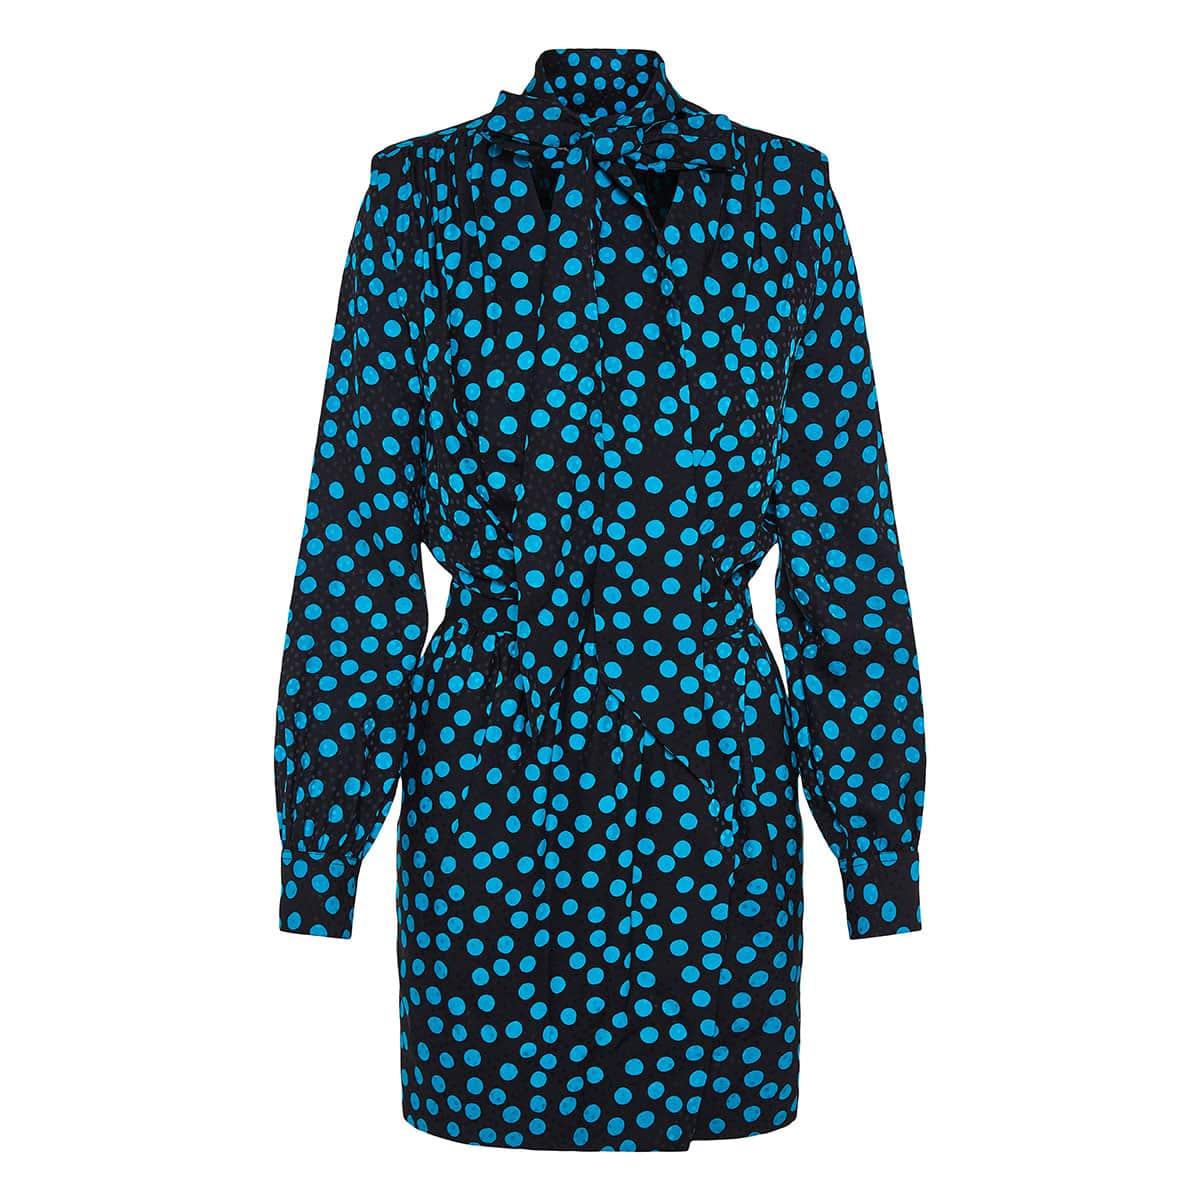 Bow-tie polka-dot wrap mini dress